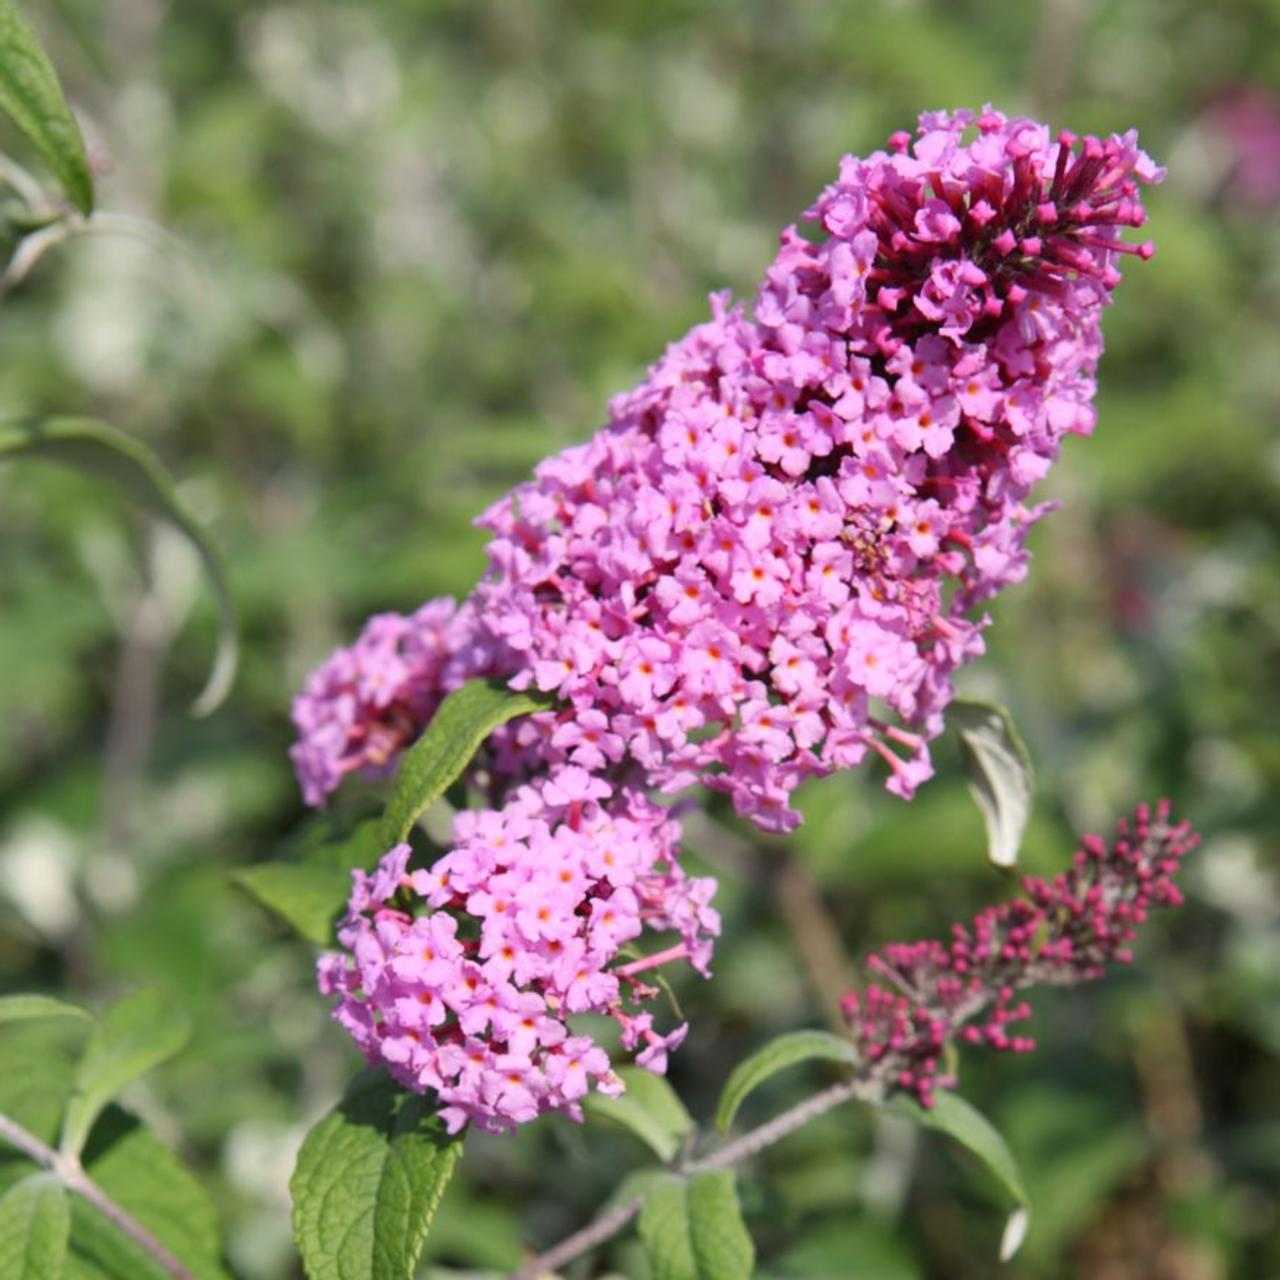 Buddleja davidii 'Pink Delight' plant